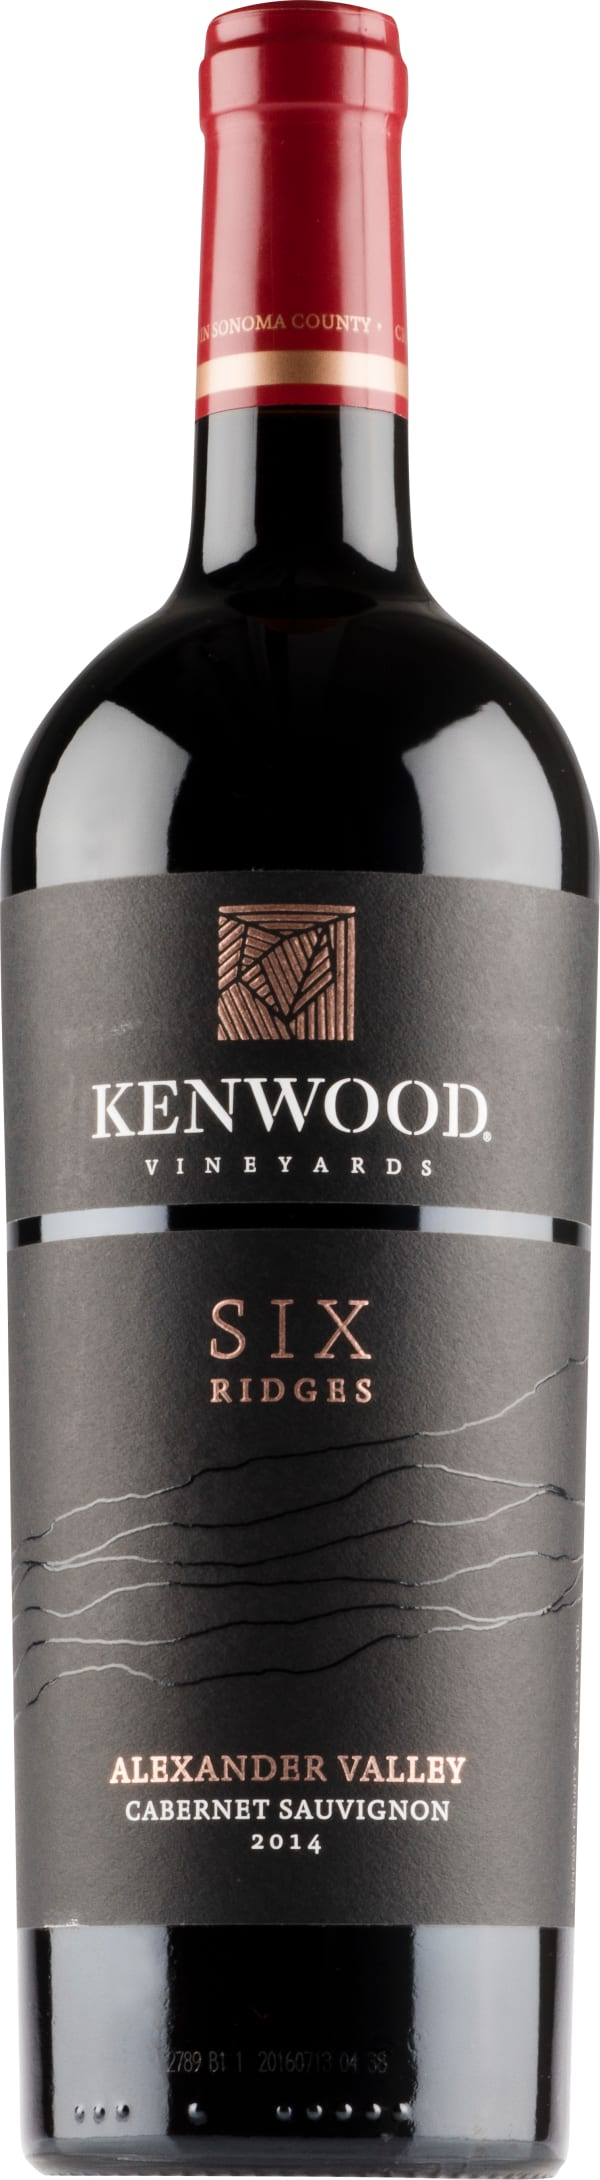 Kenwood Six Ridges Cabernet Sauvignon 2015